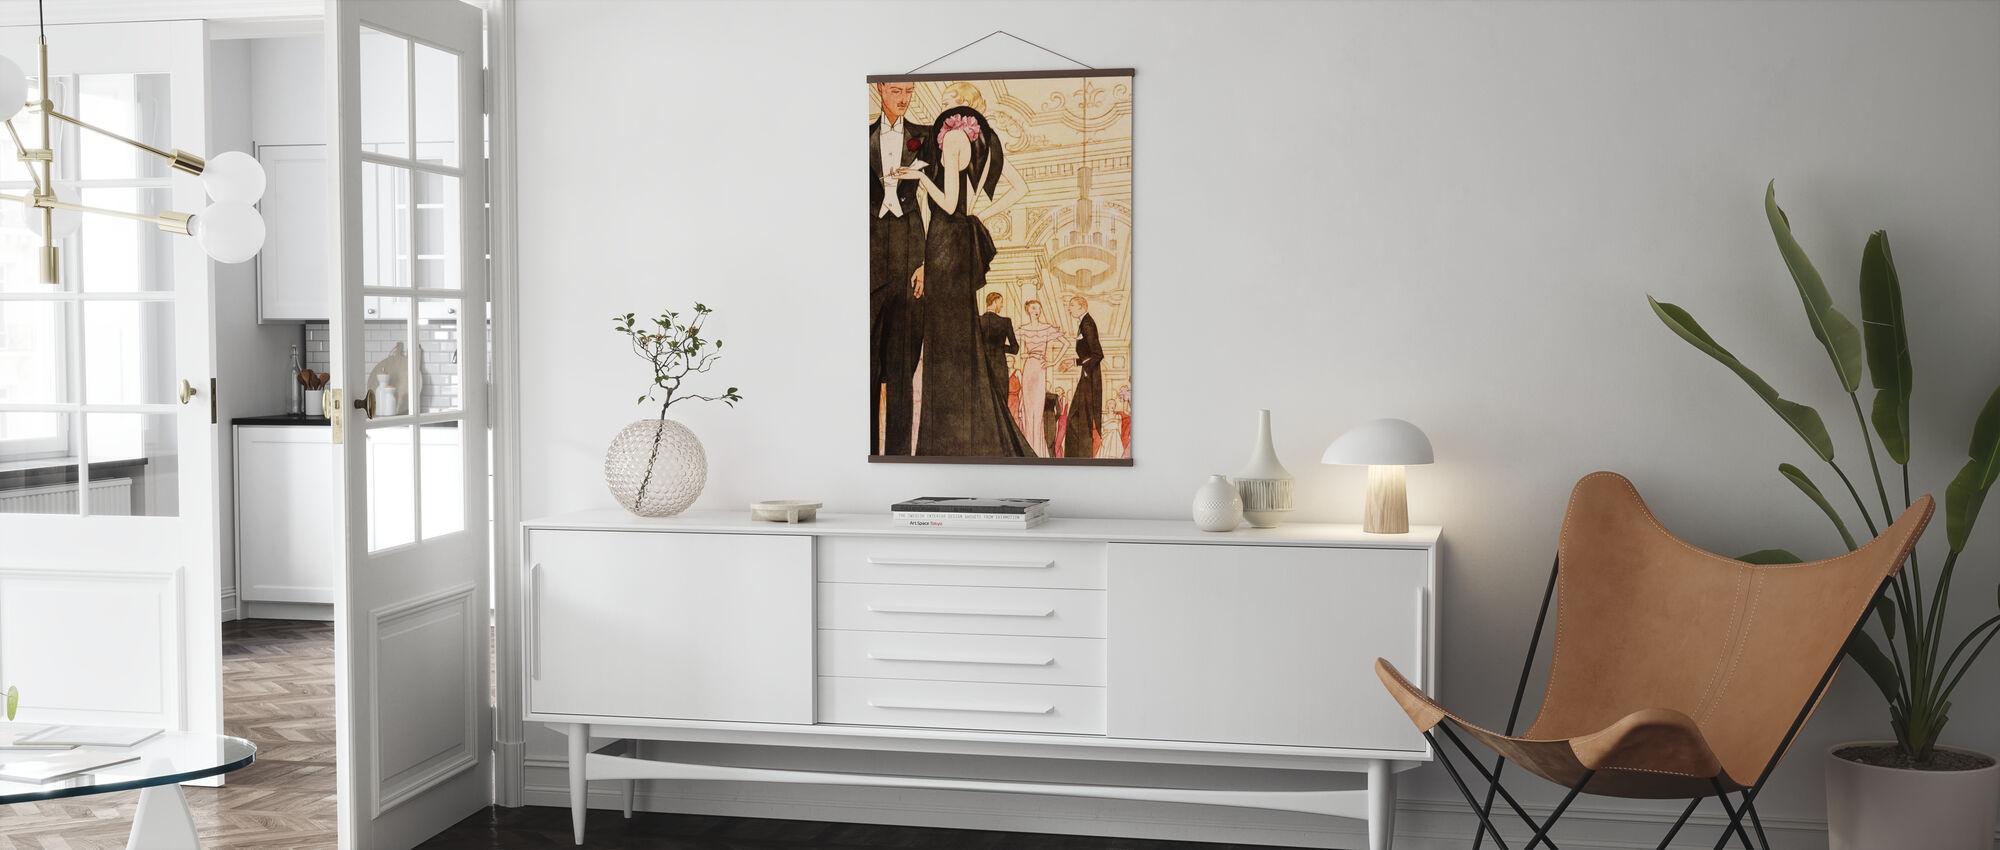 Evening Scene, National Magazines - Poster - Living Room